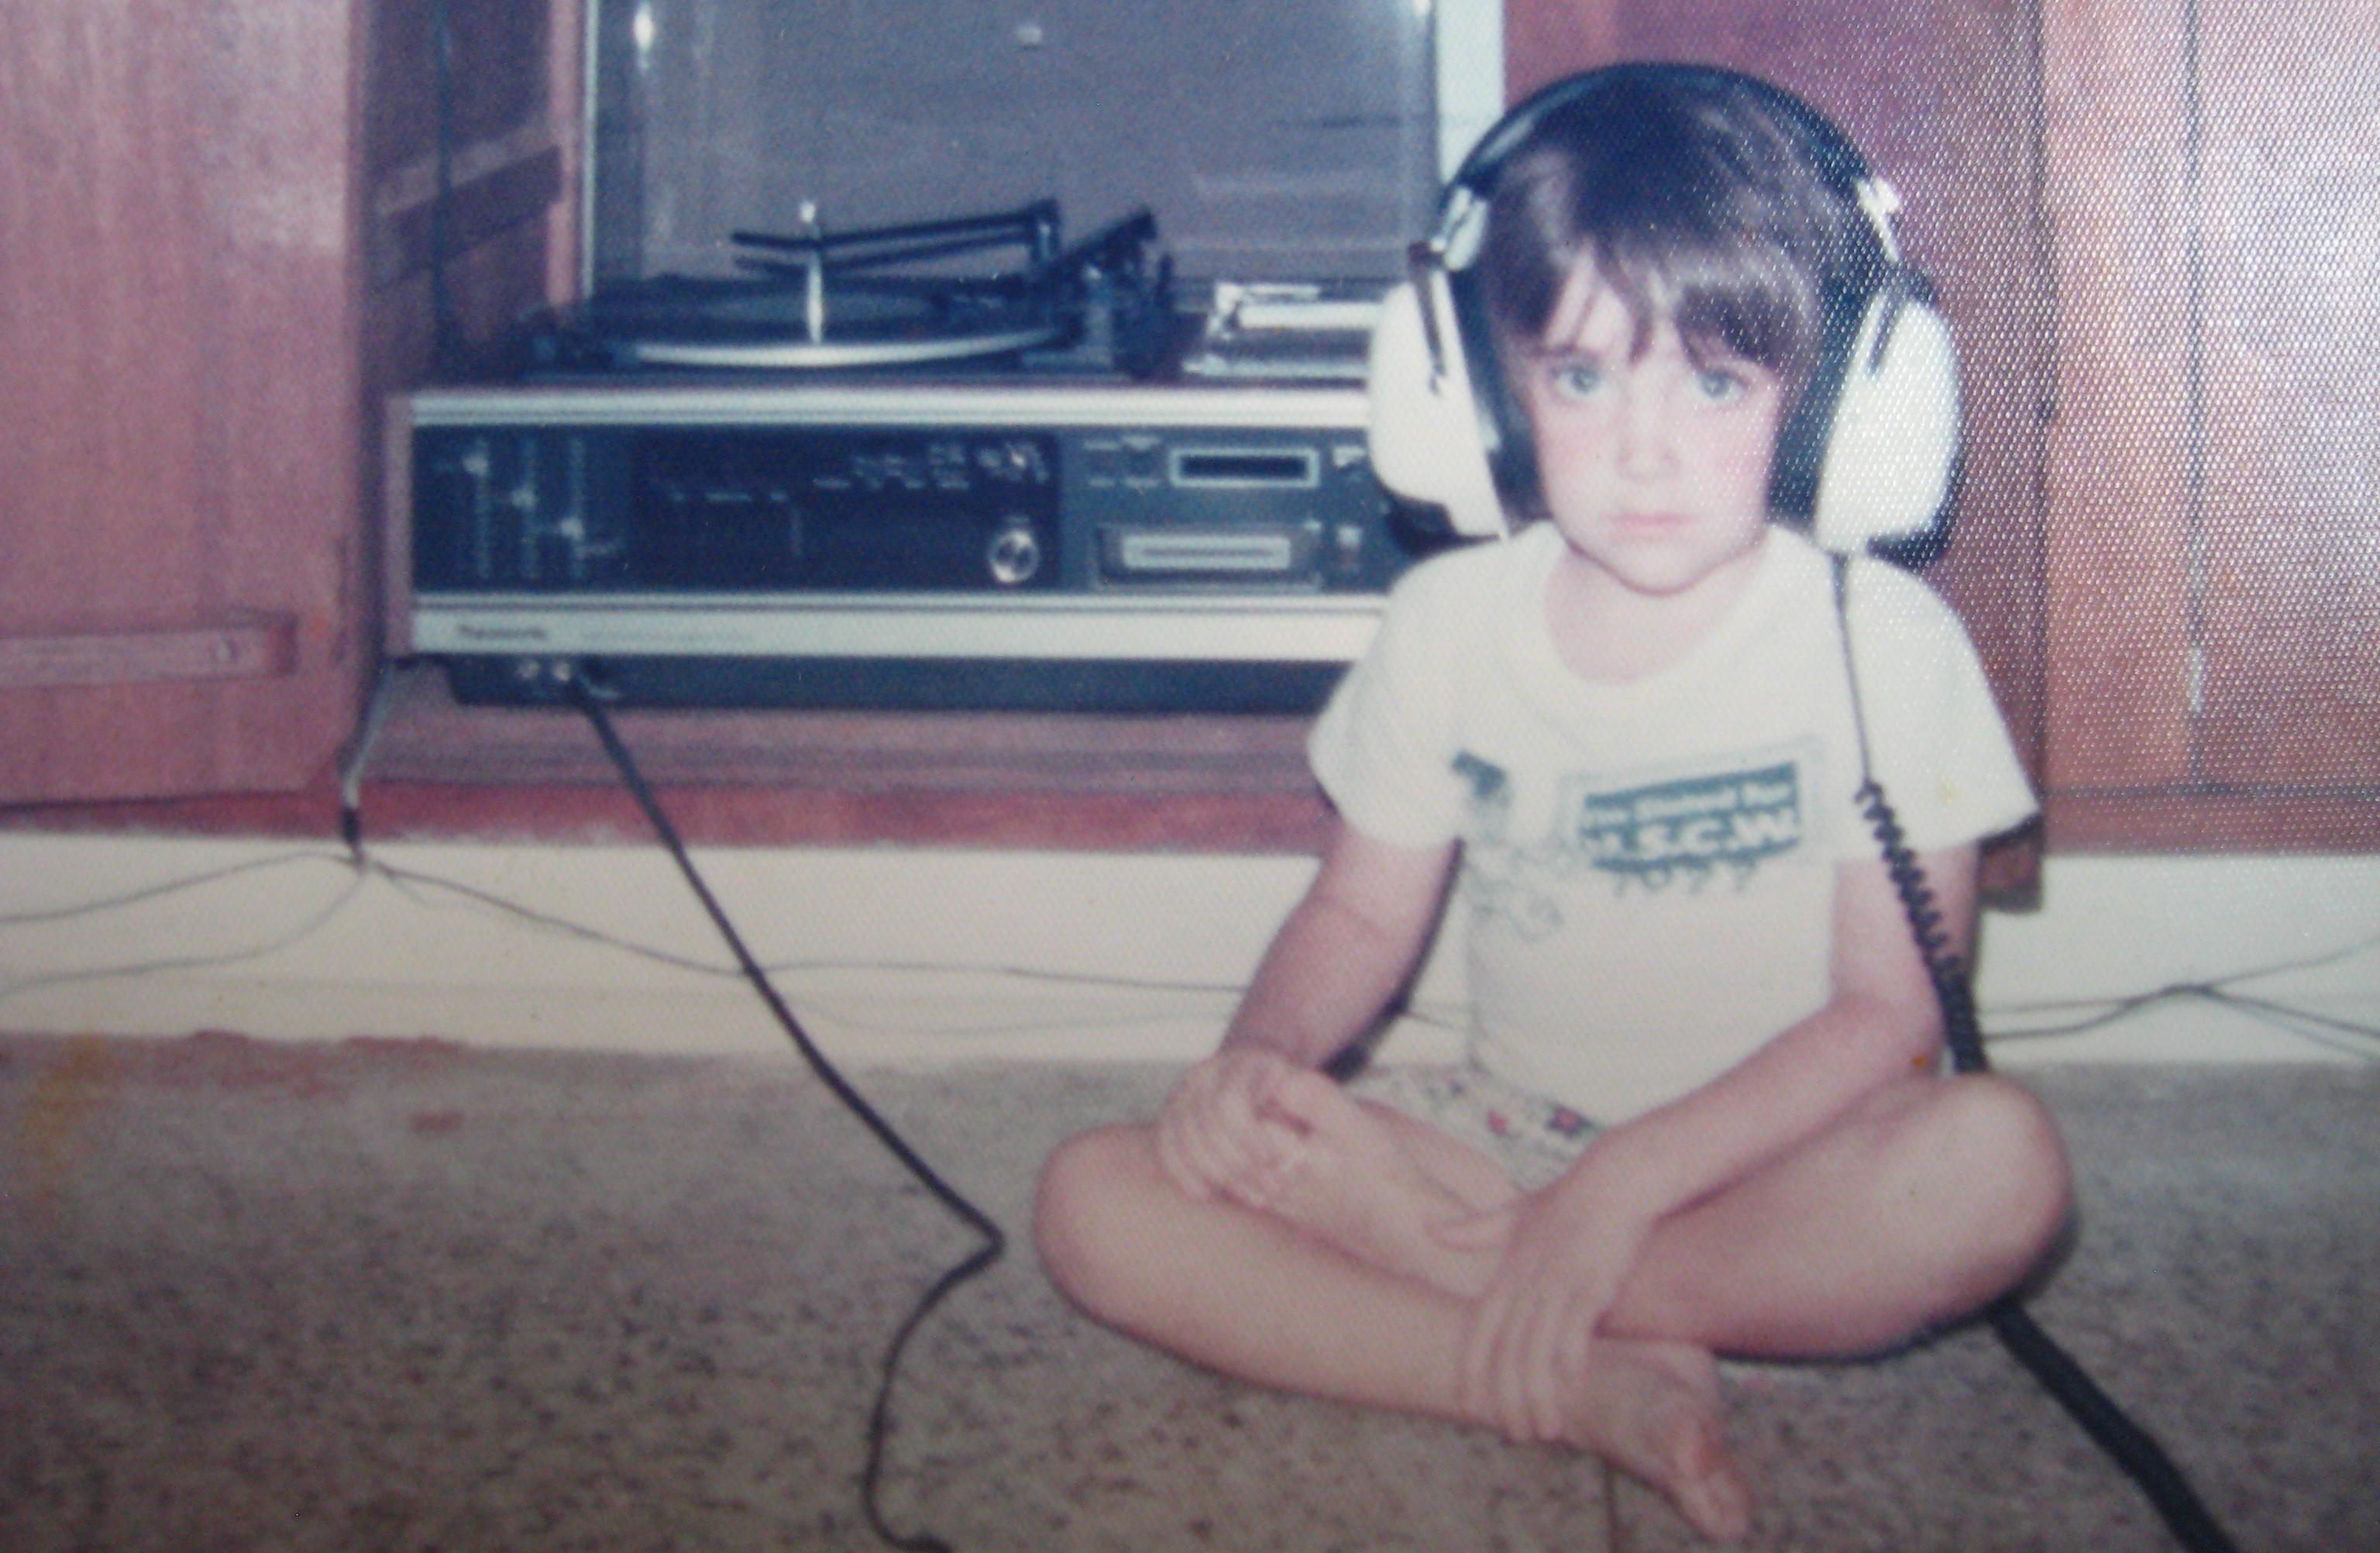 Antes fossem os meus audiófilos... - Página 3 Img_75571